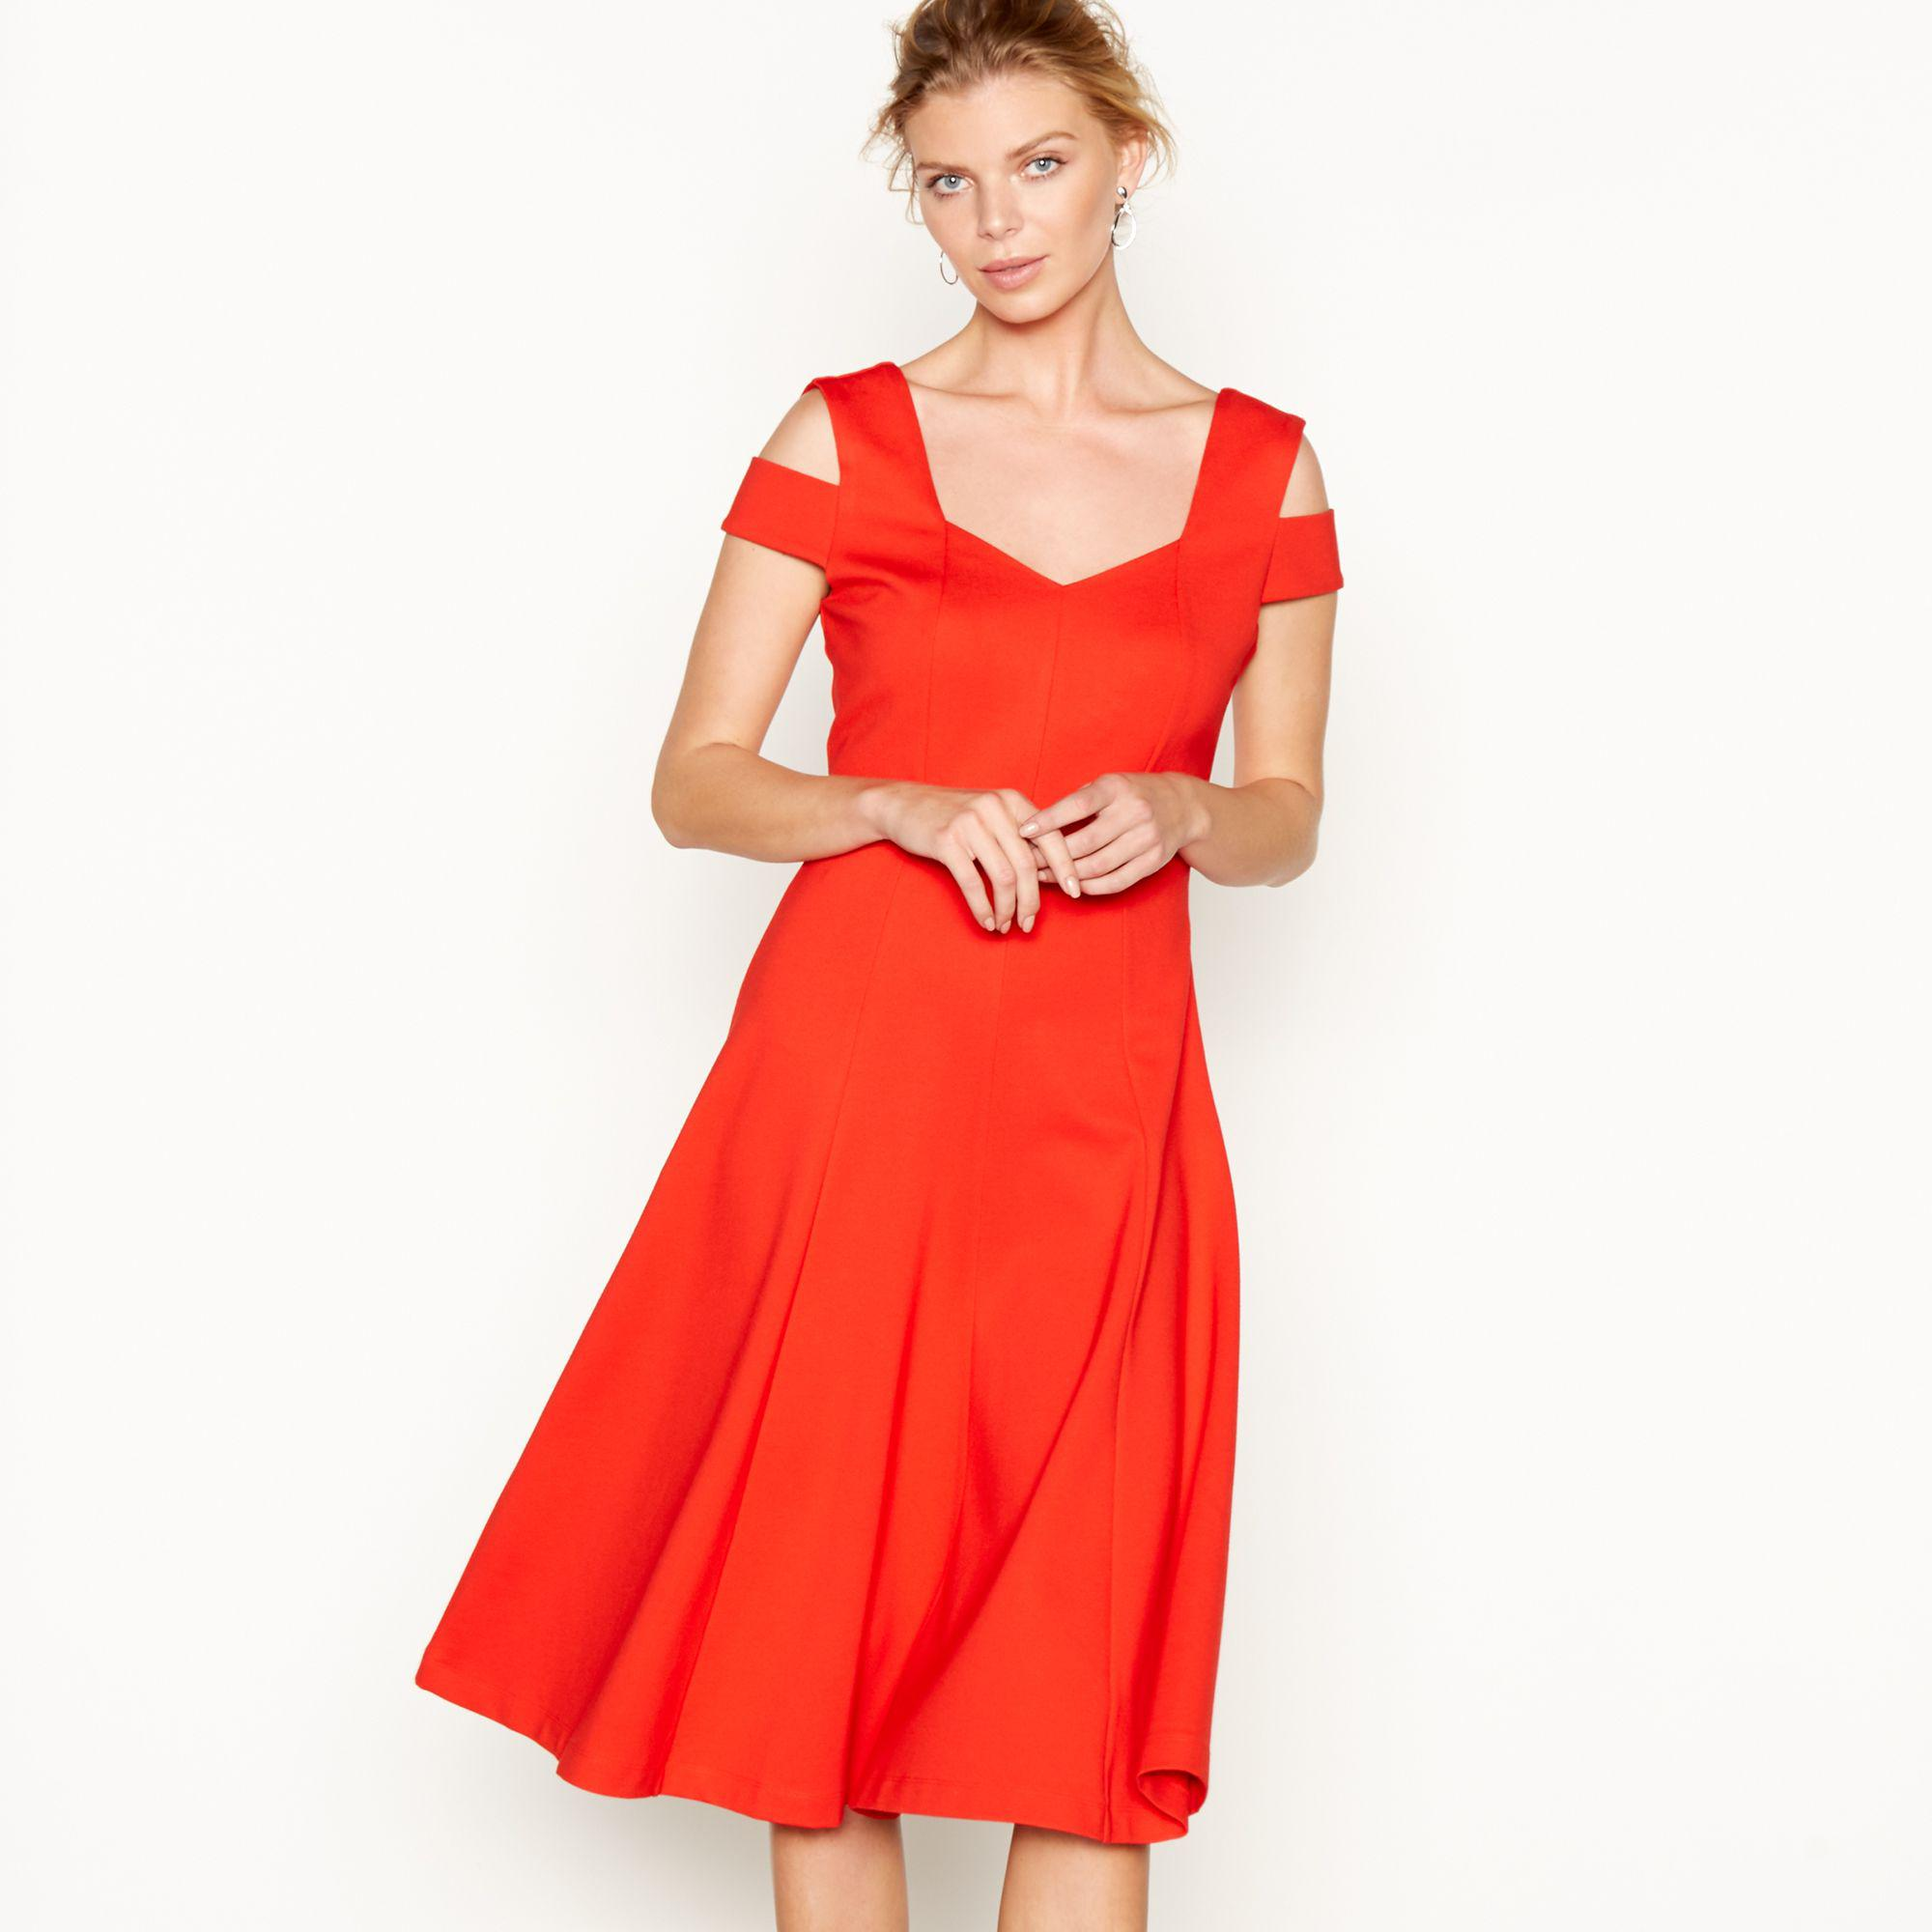 J By Jasper Conran Red Double Strap V-neck Knee Length Skater Dress ... 76baa5cf3